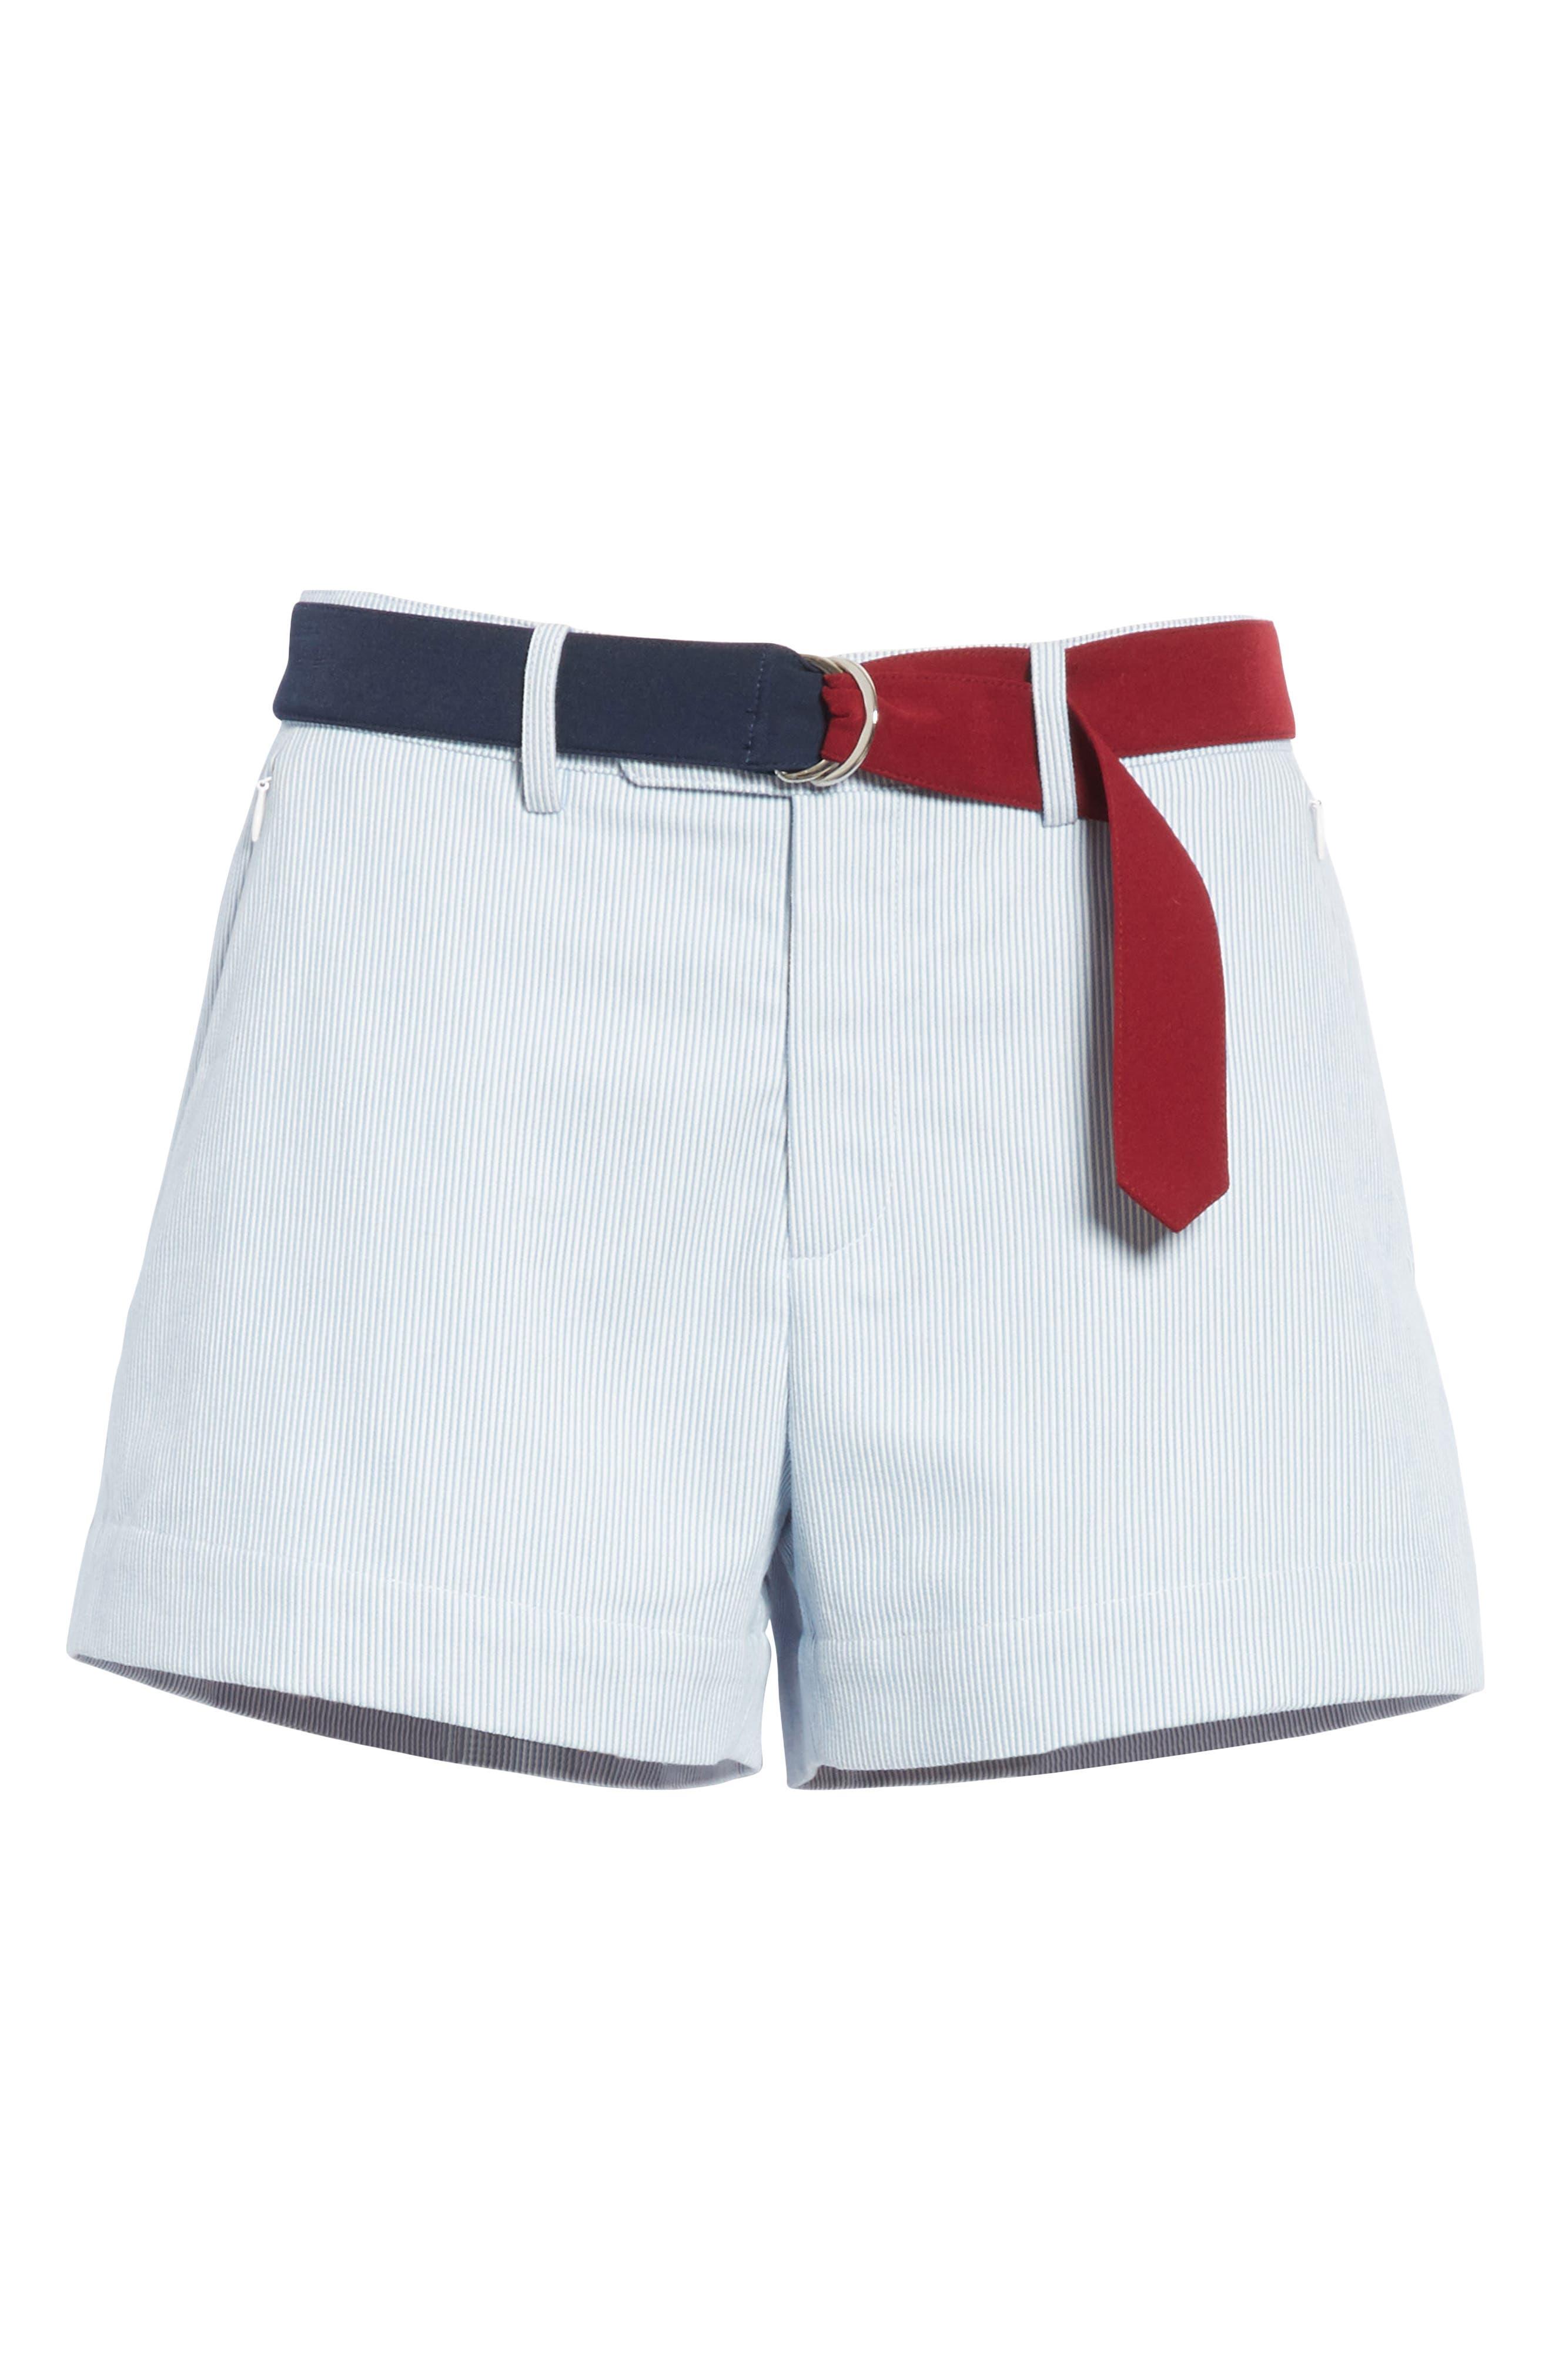 Multi Belt Shorts,                             Alternate thumbnail 6, color,                             Chambray Blue